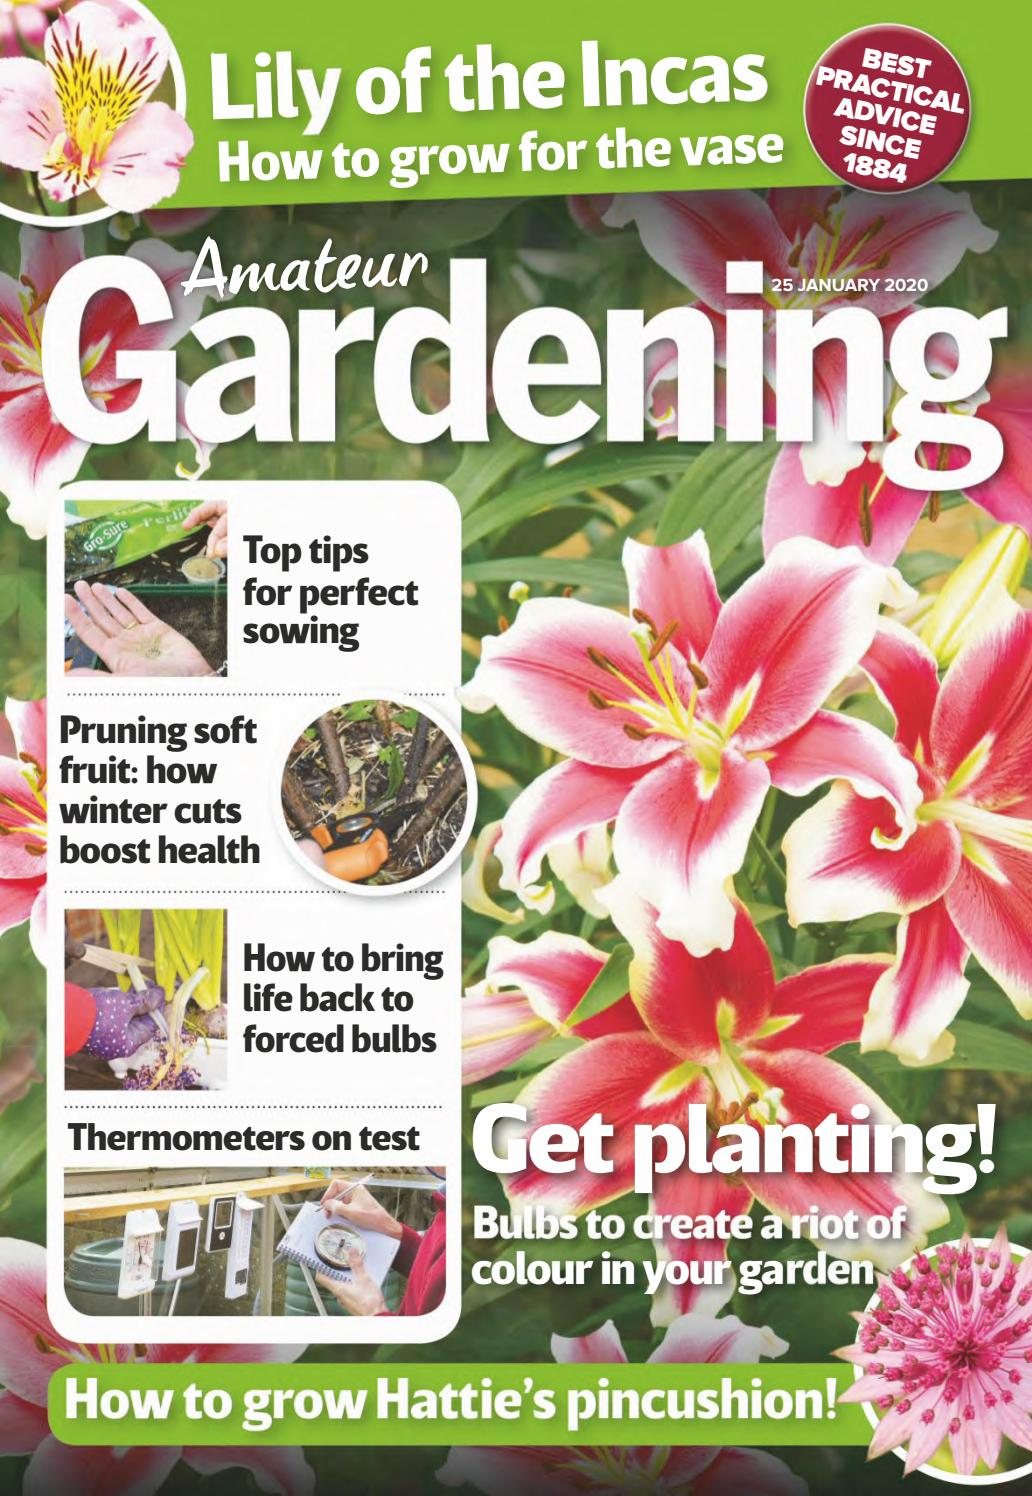 Epimedium davidii perennial plant ideal ground cover any aspect 9cm pot FREE DELIVERY